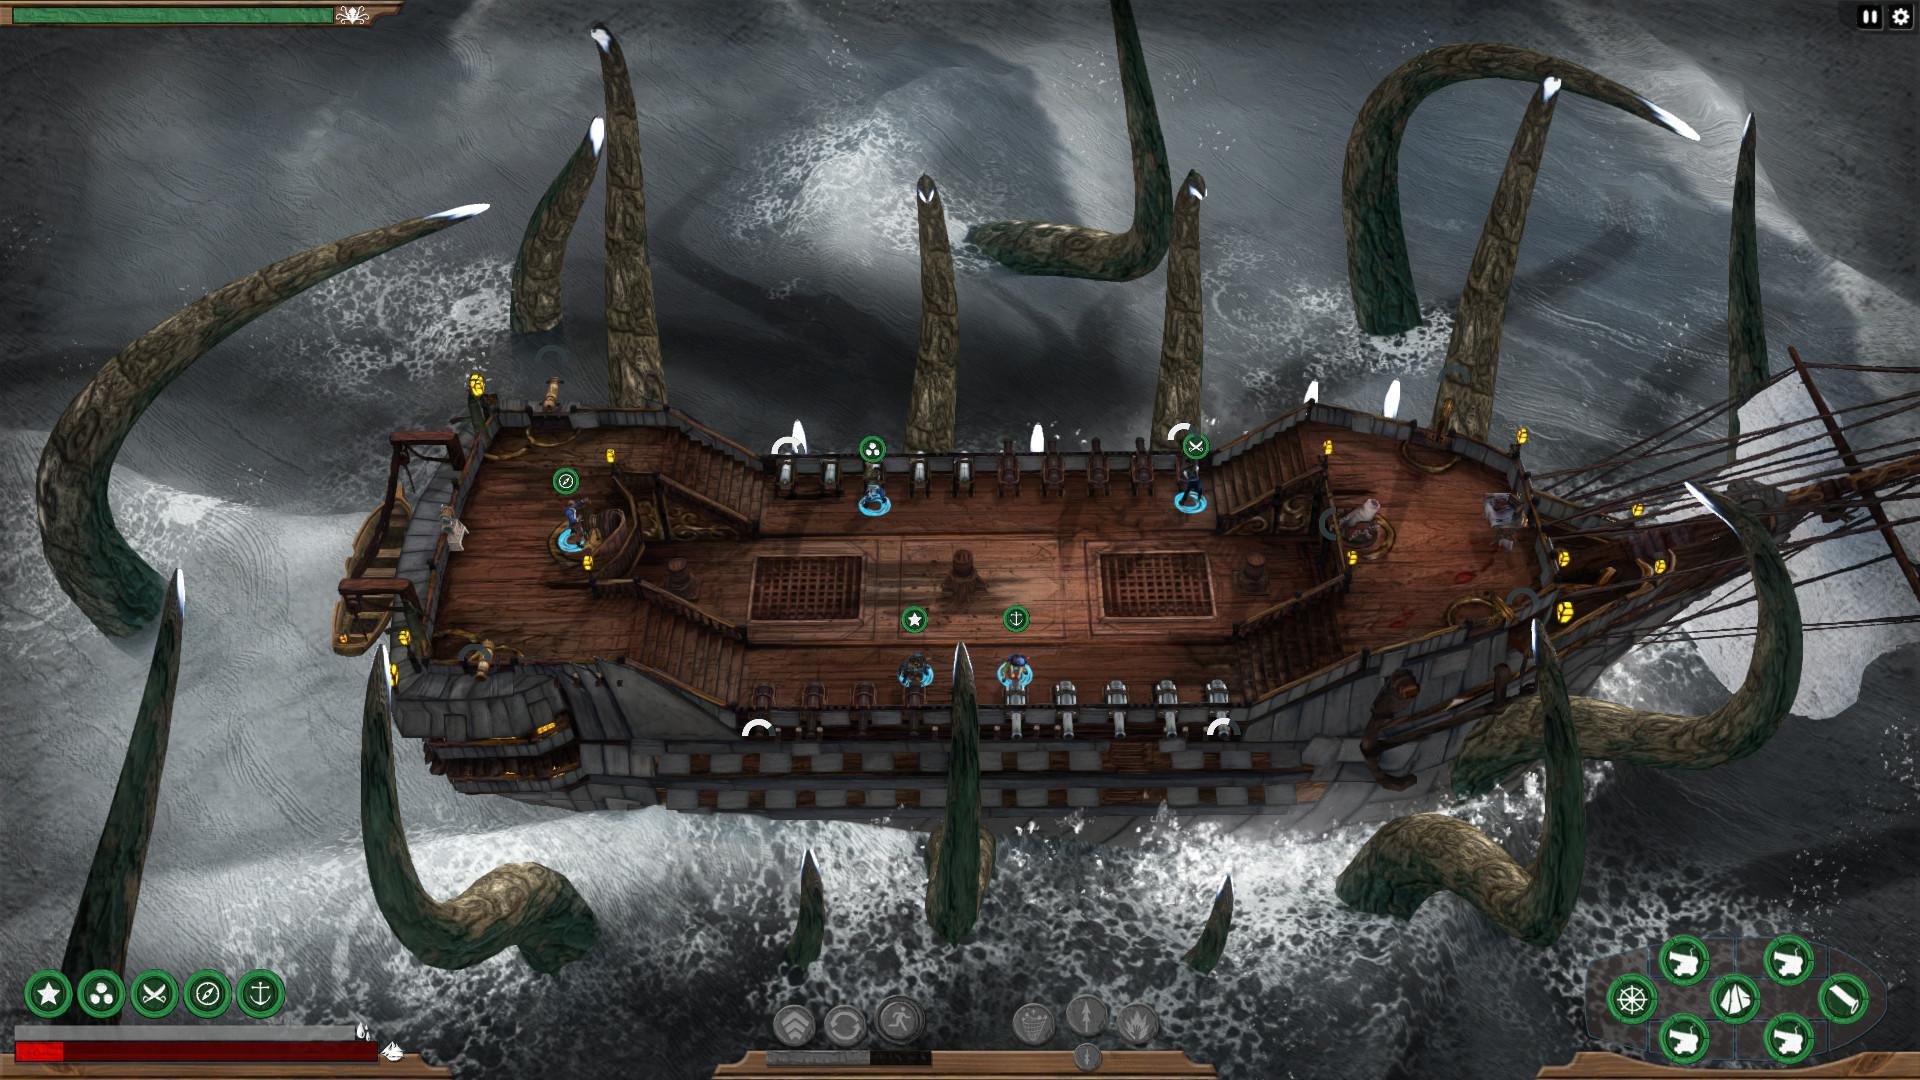 Image result for Abandon Ship game